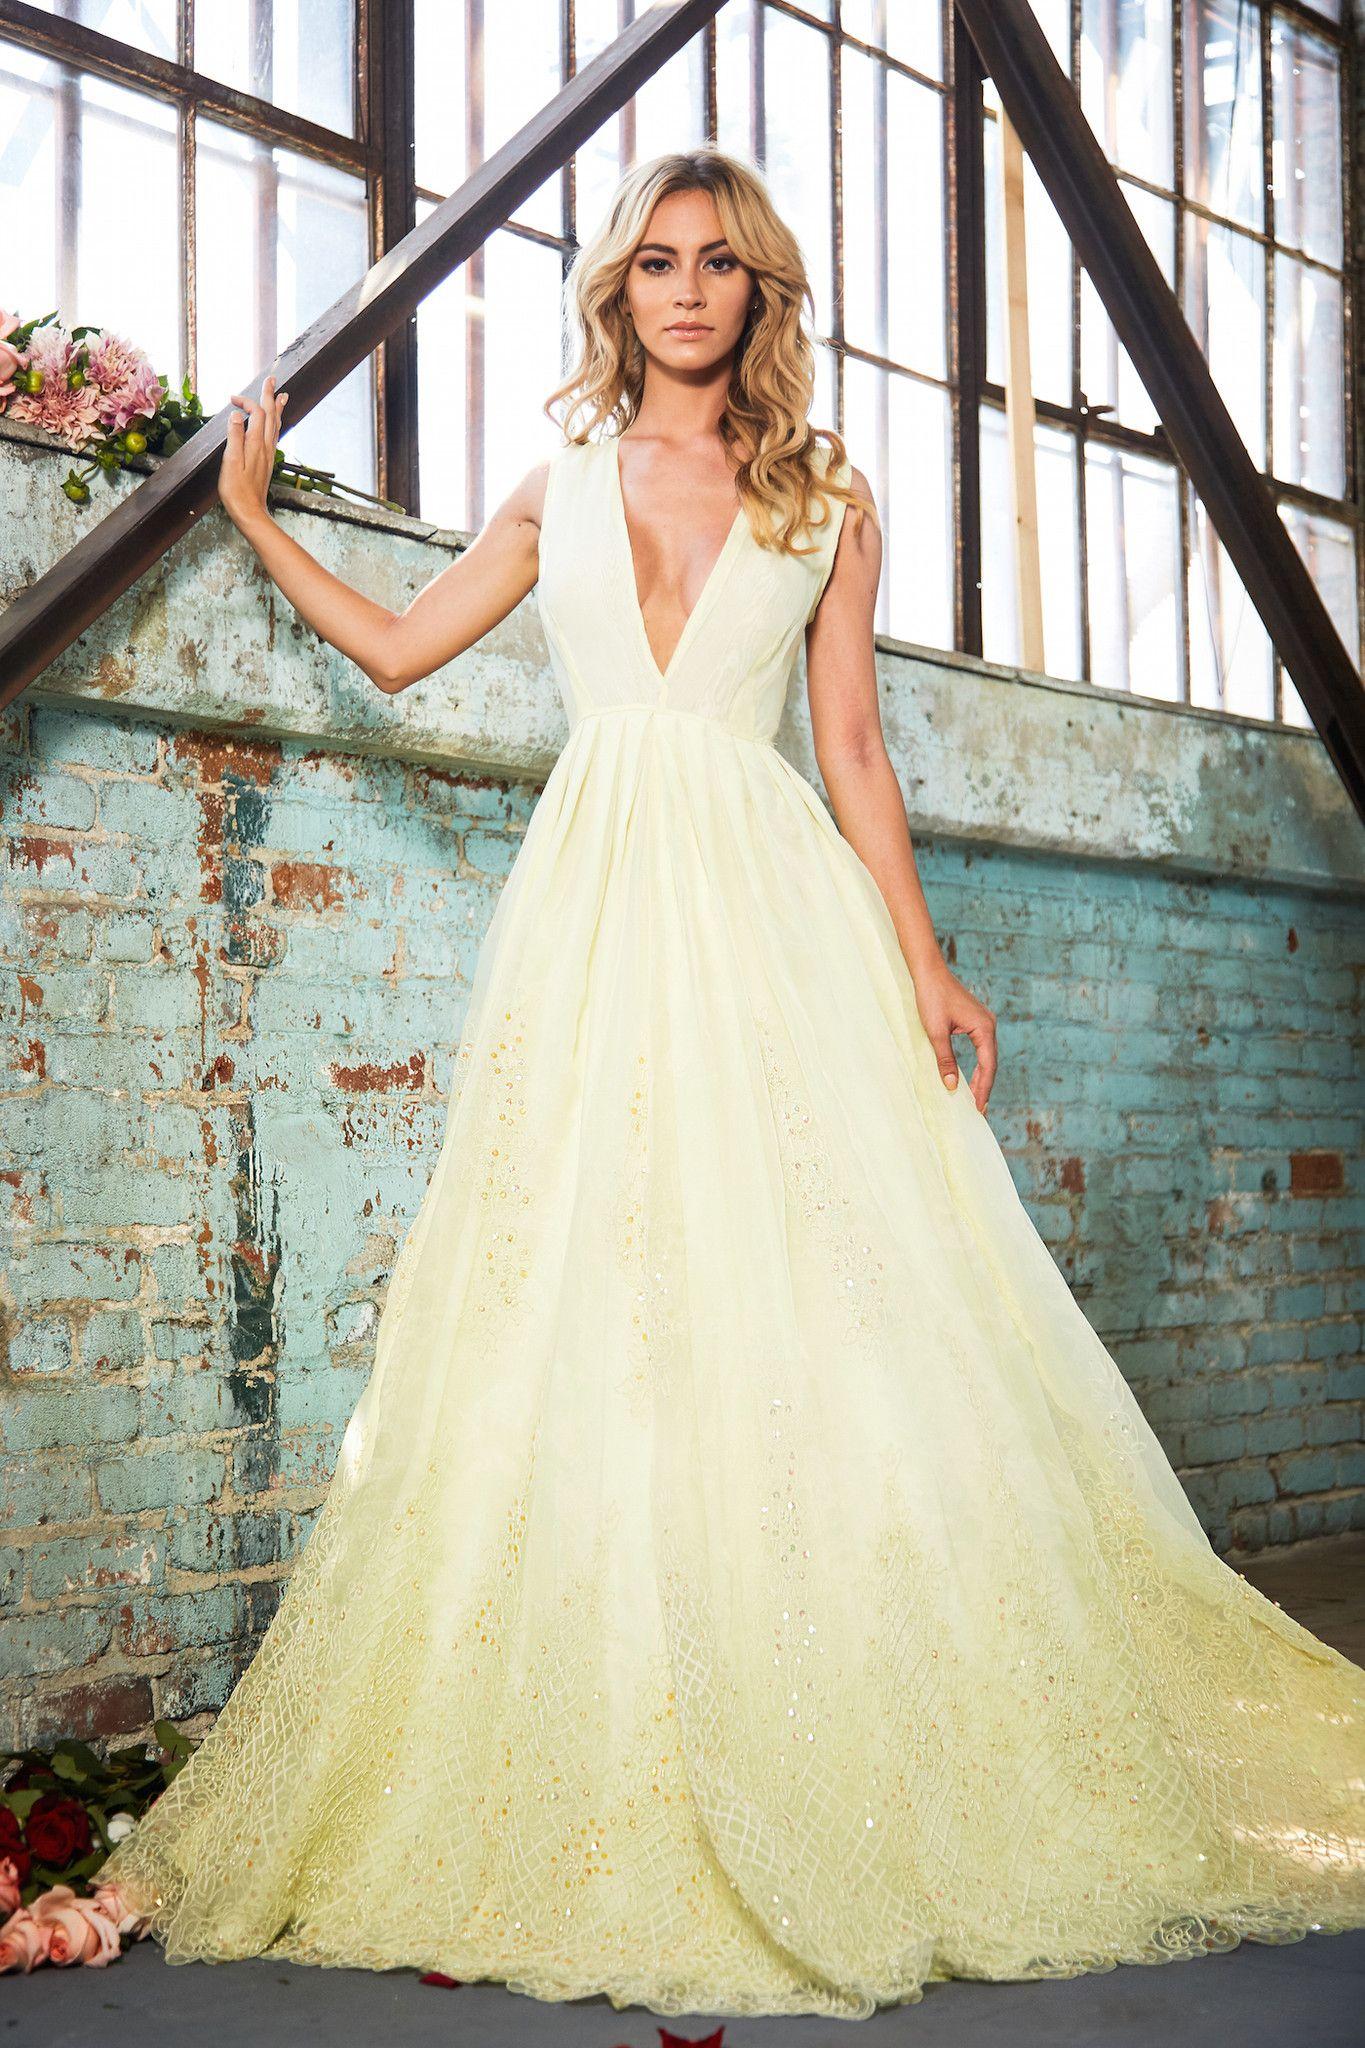 Wedding dress dry cleaning near me  Lurelly Bridal High Fashion Wedding Dresses Inspiration  Pinterest